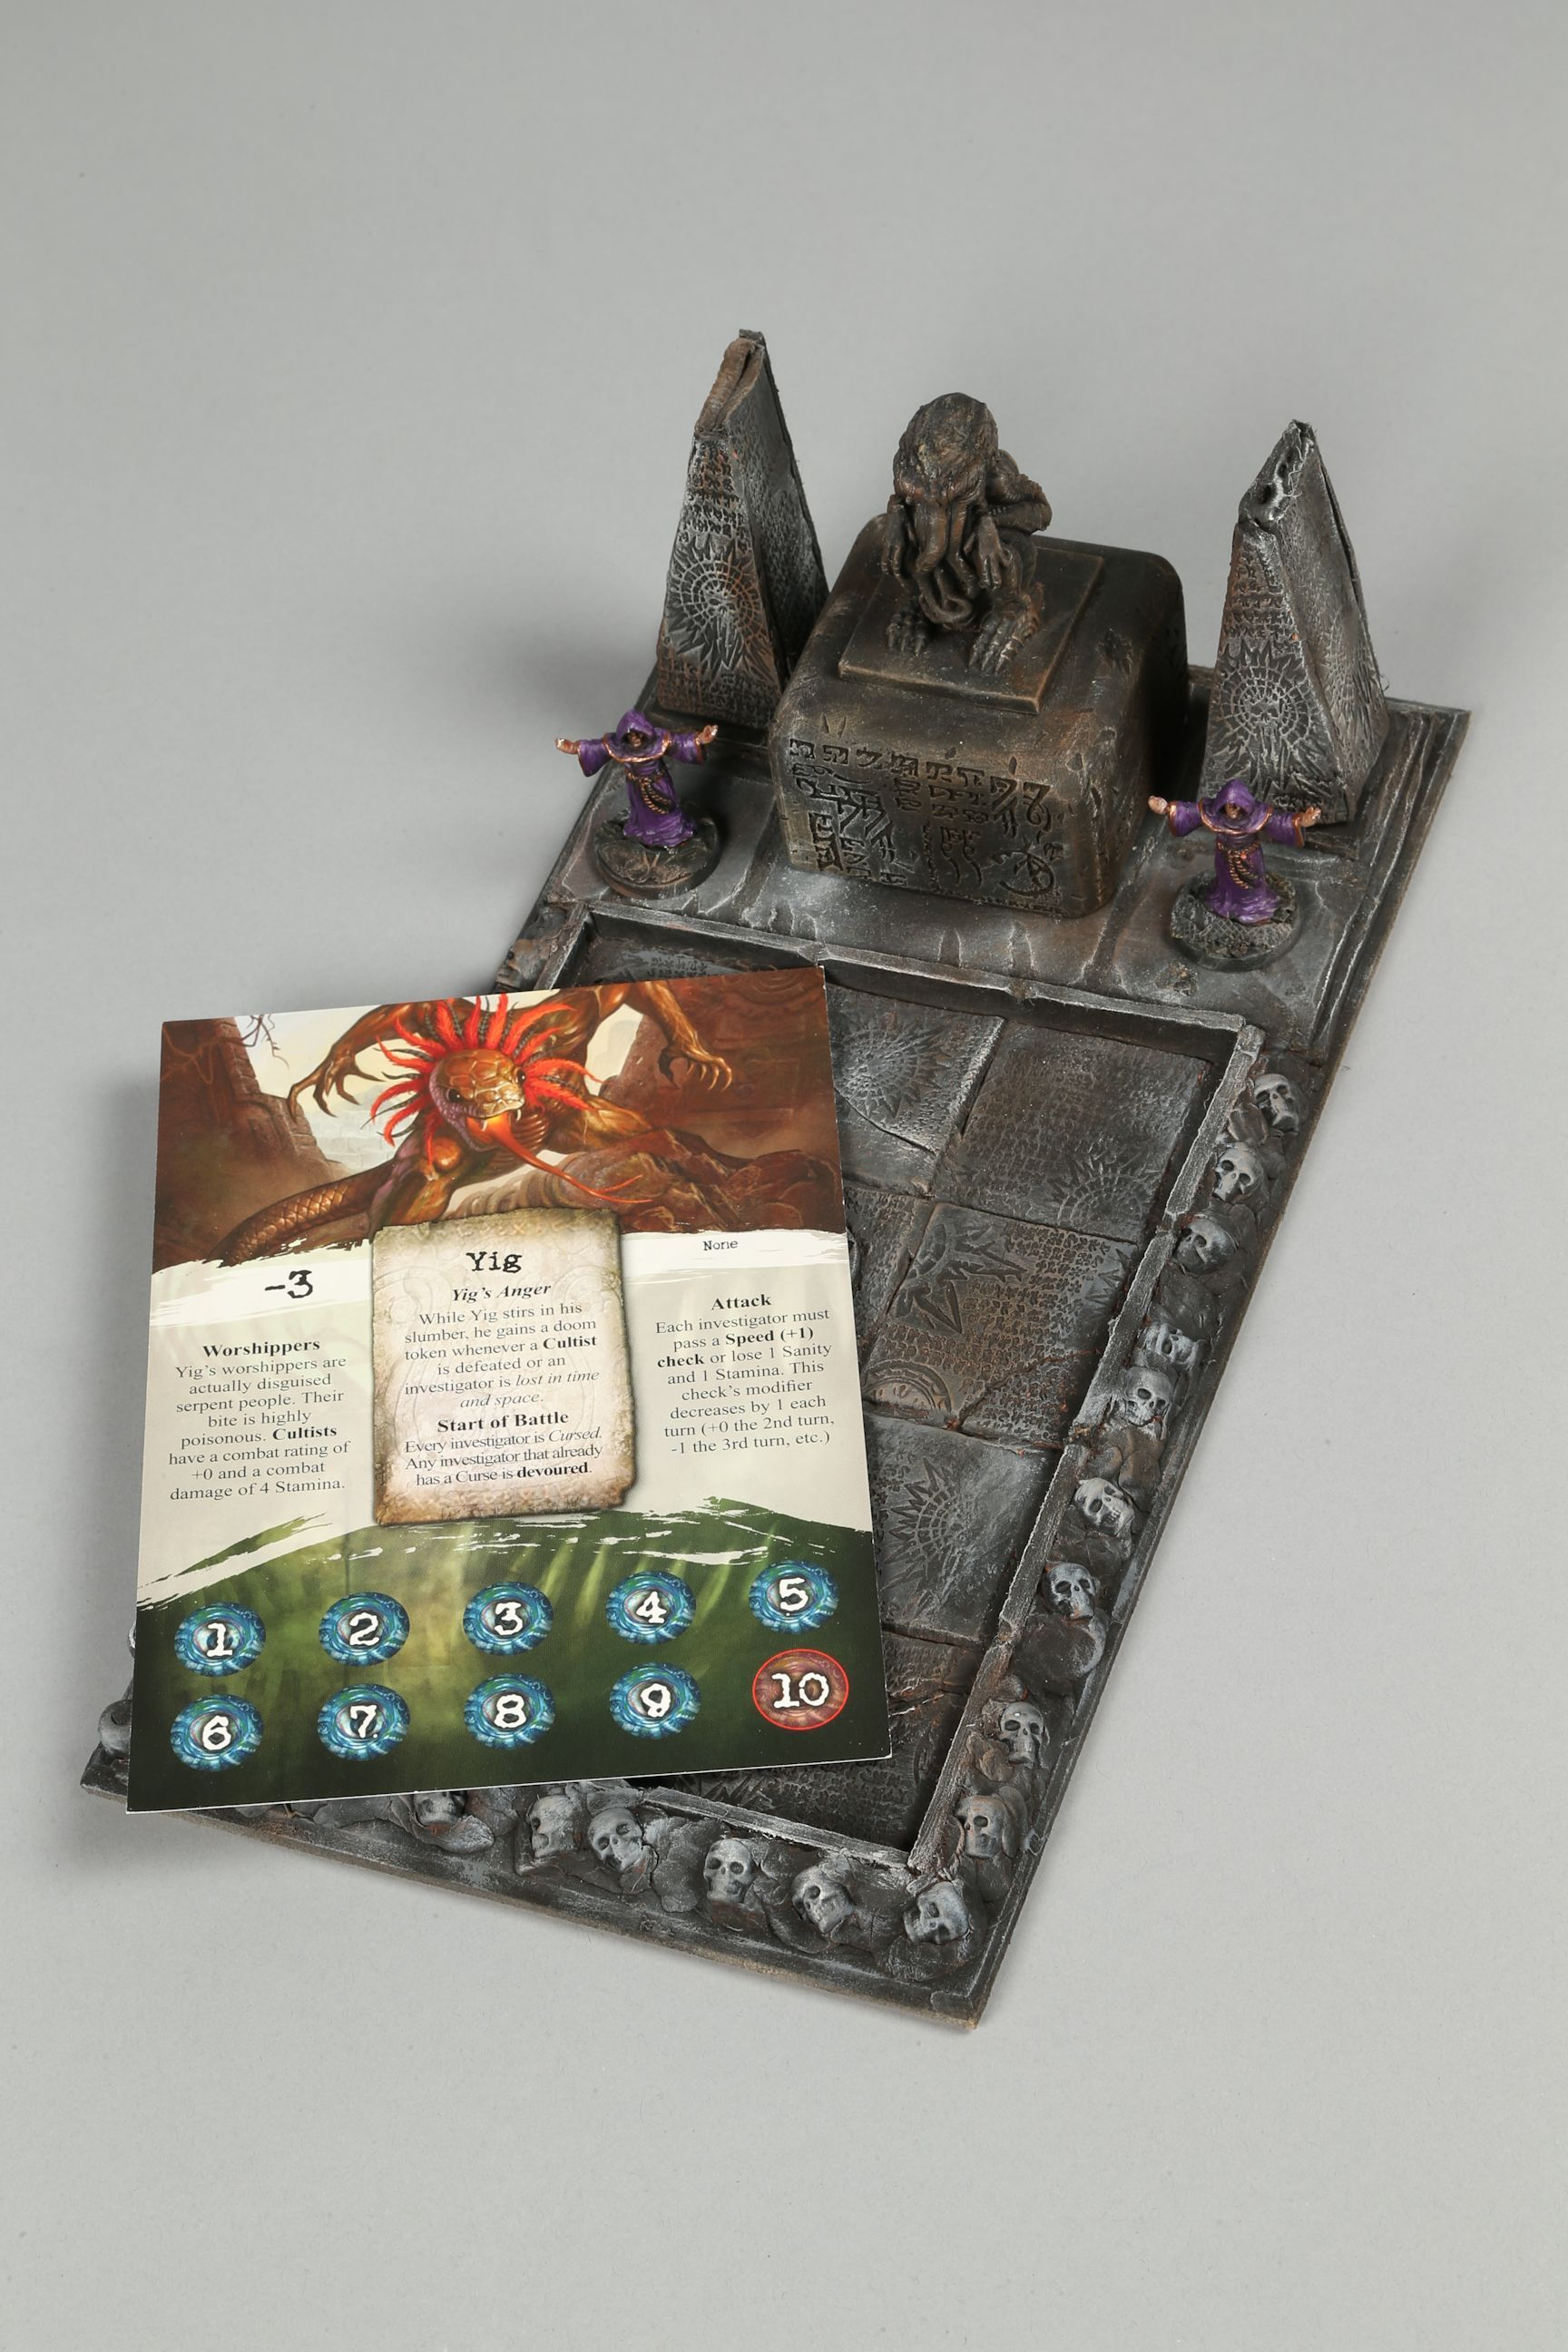 Homemade card and counter holder arkham cthulhu Custom